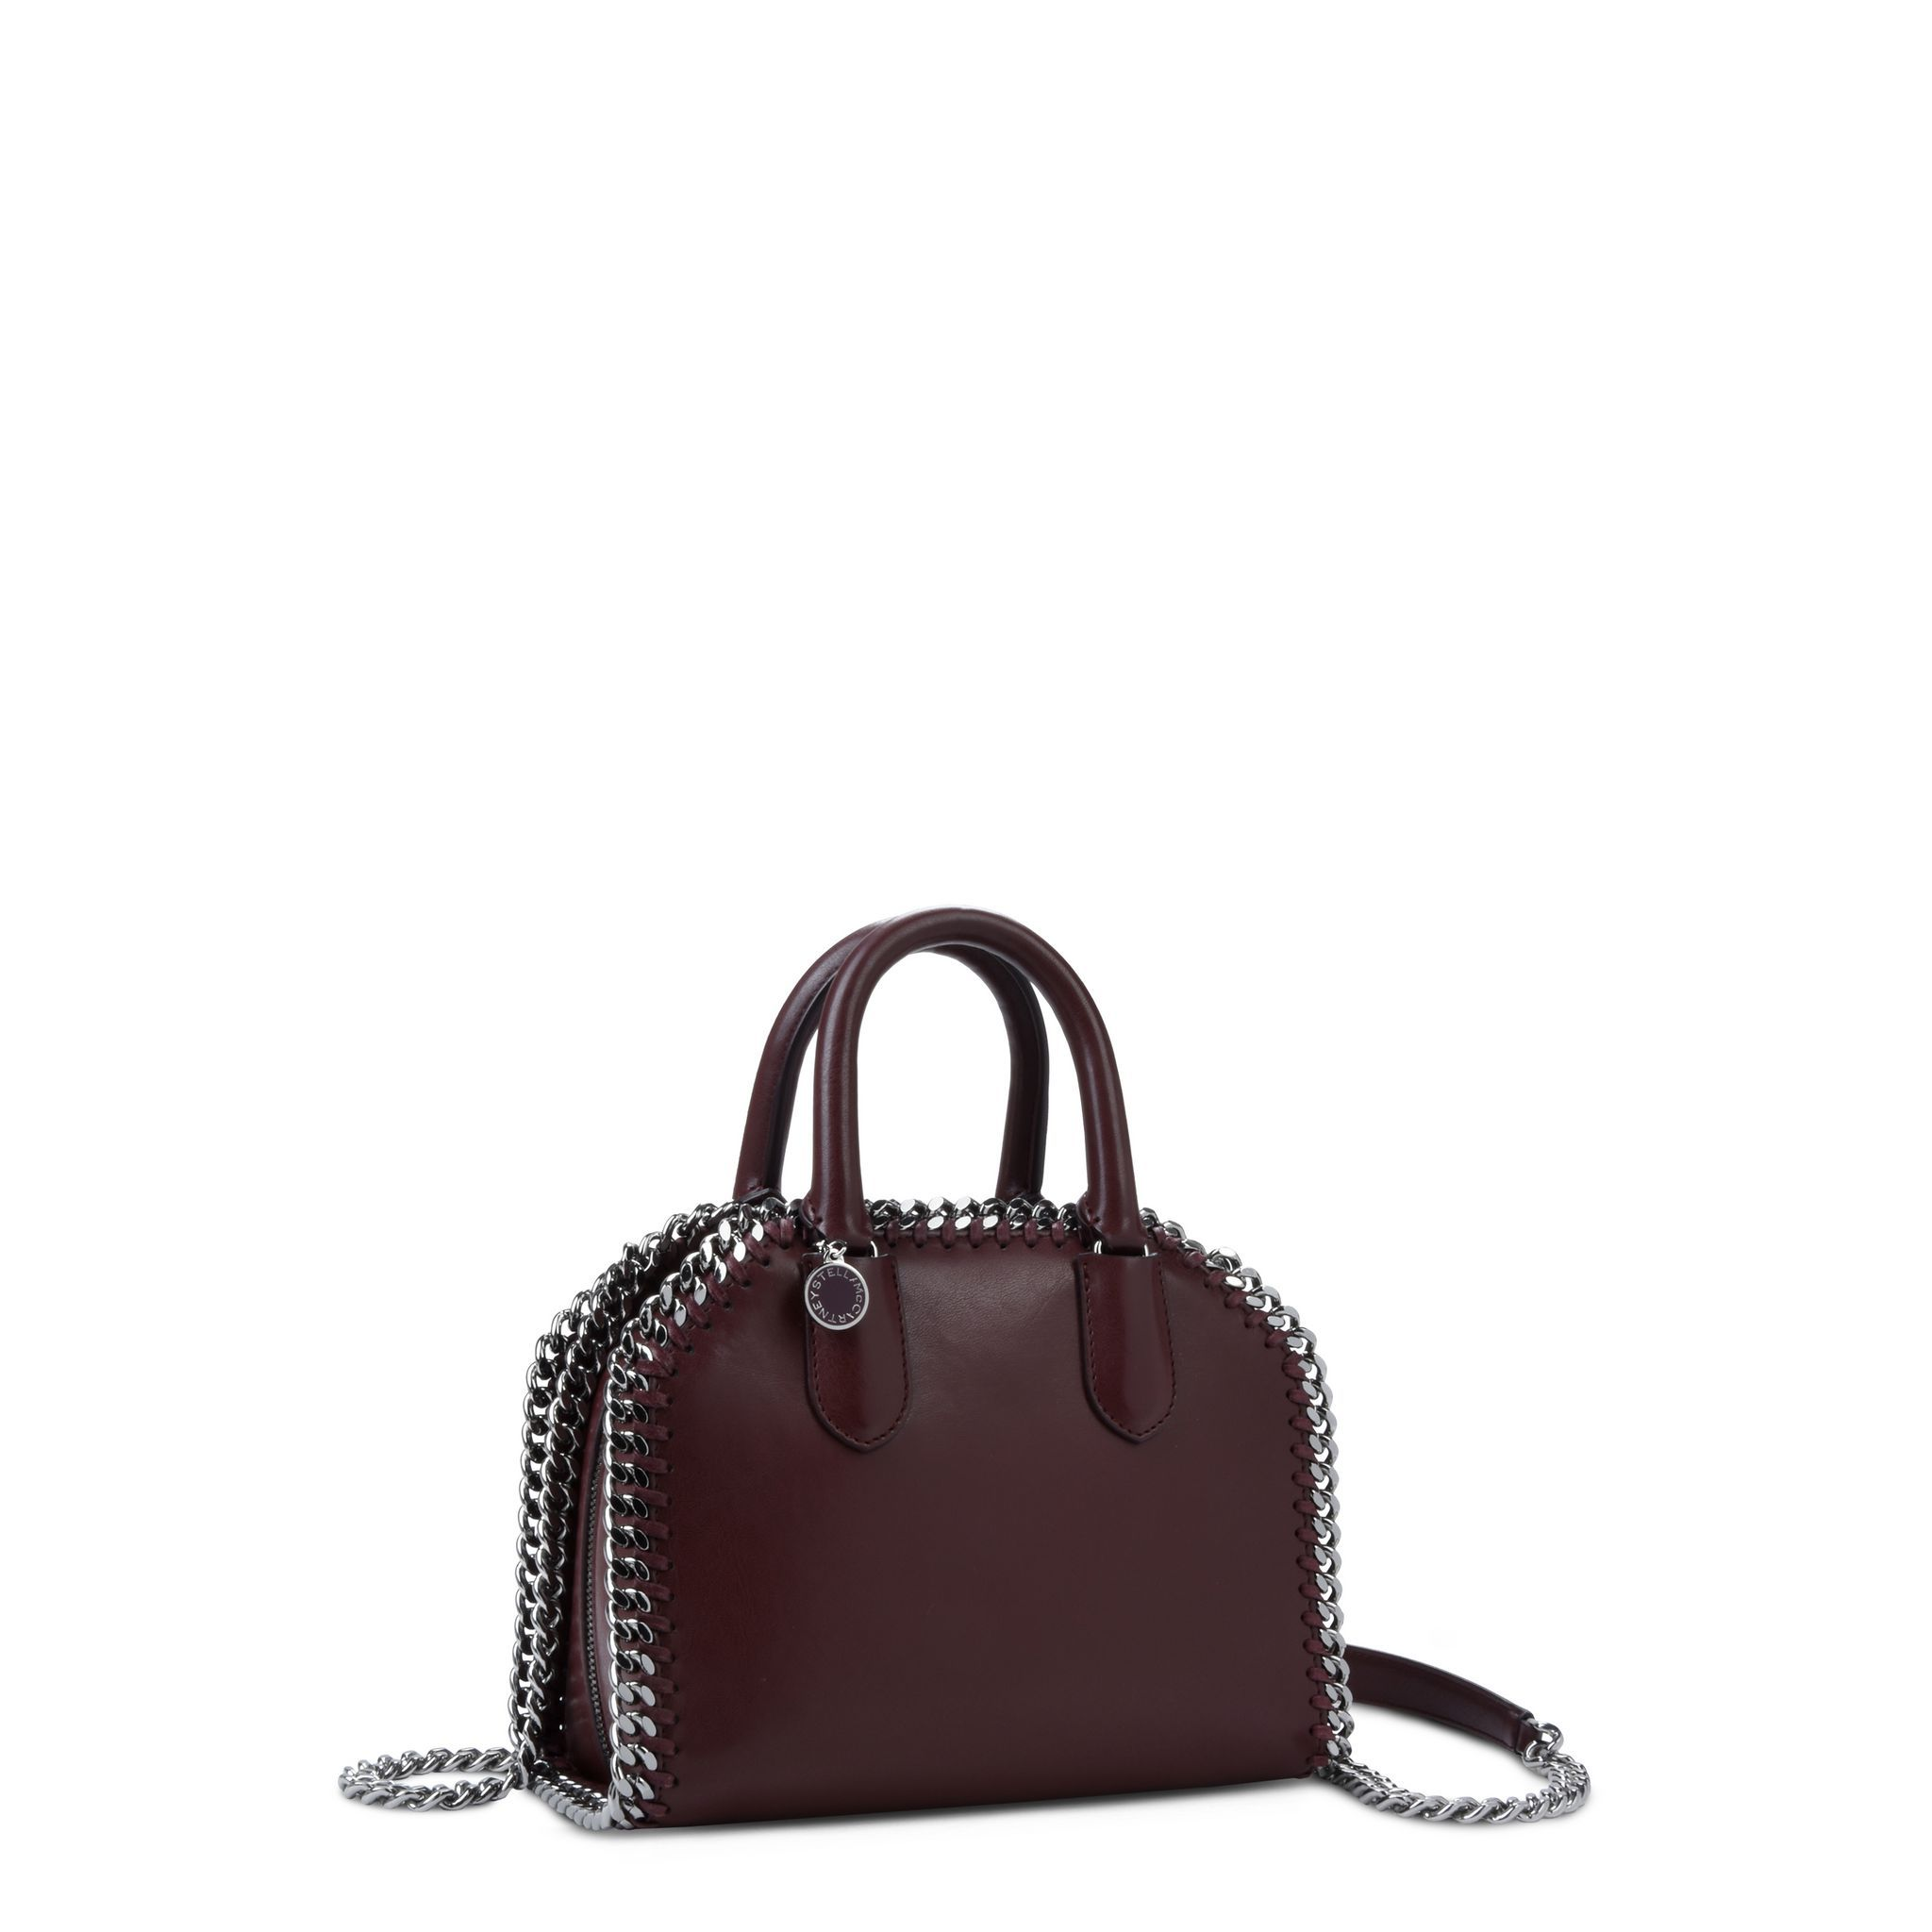 61f95ca9e7 Burgundy Falabella Box Mini Top Handle Bag - Stella Mccartney ...